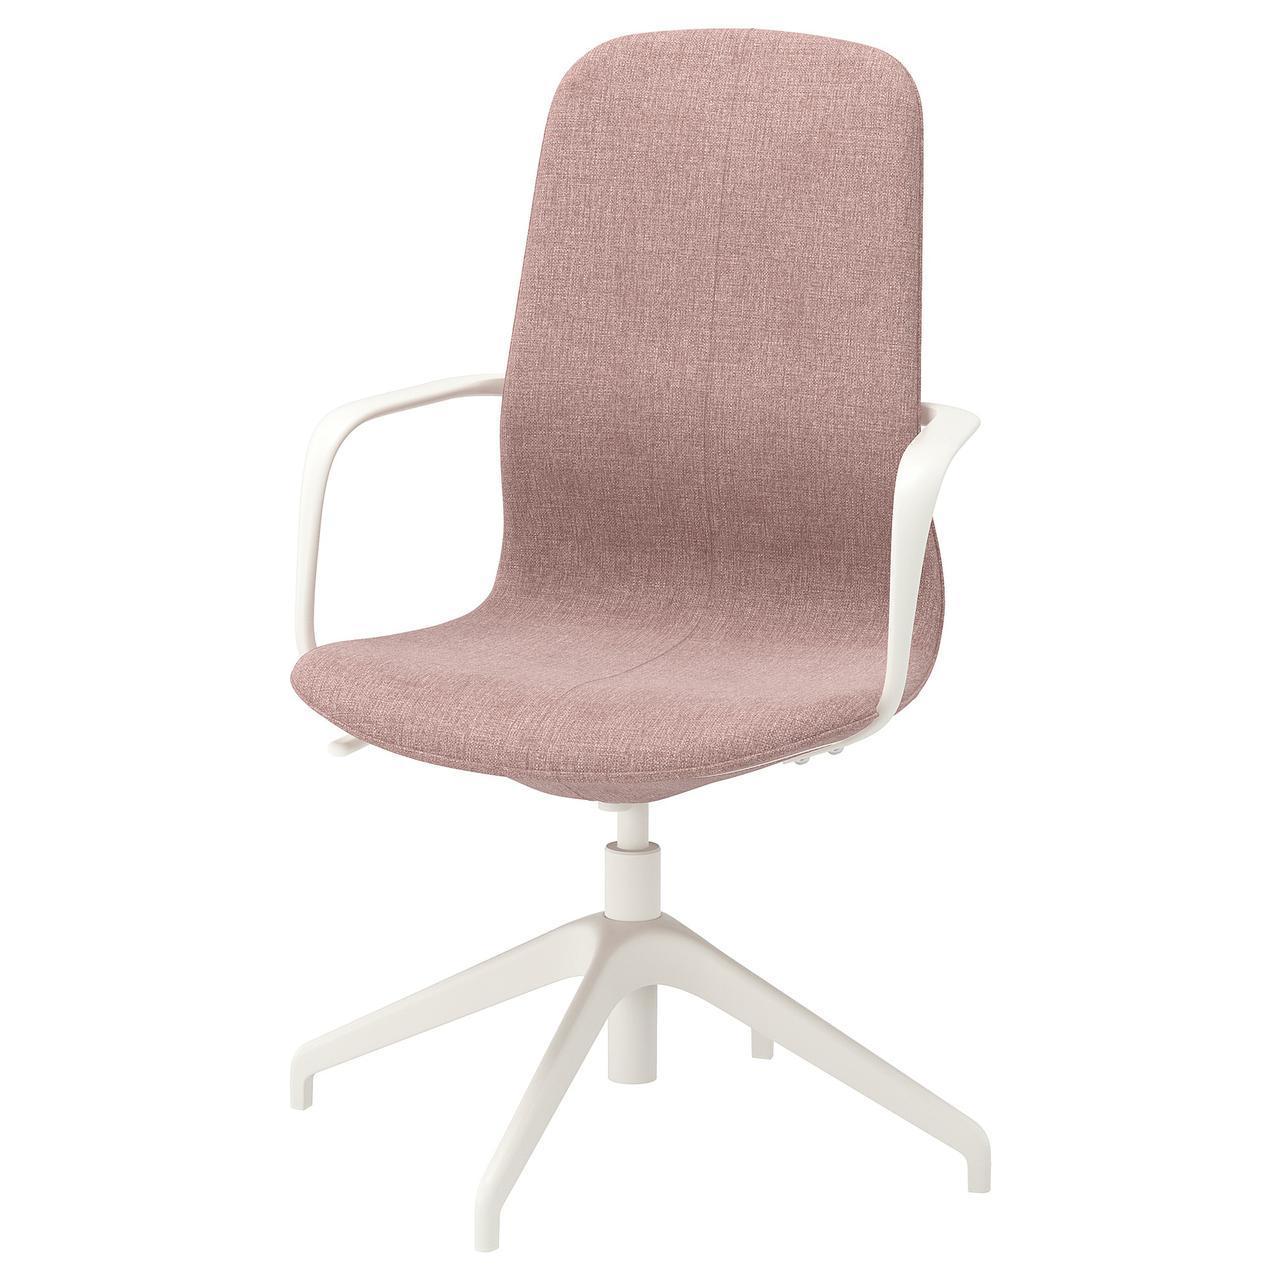 IKEA LANGFJALL (692.526.46) Компьютерное кресло, Гуннаред темно-серый